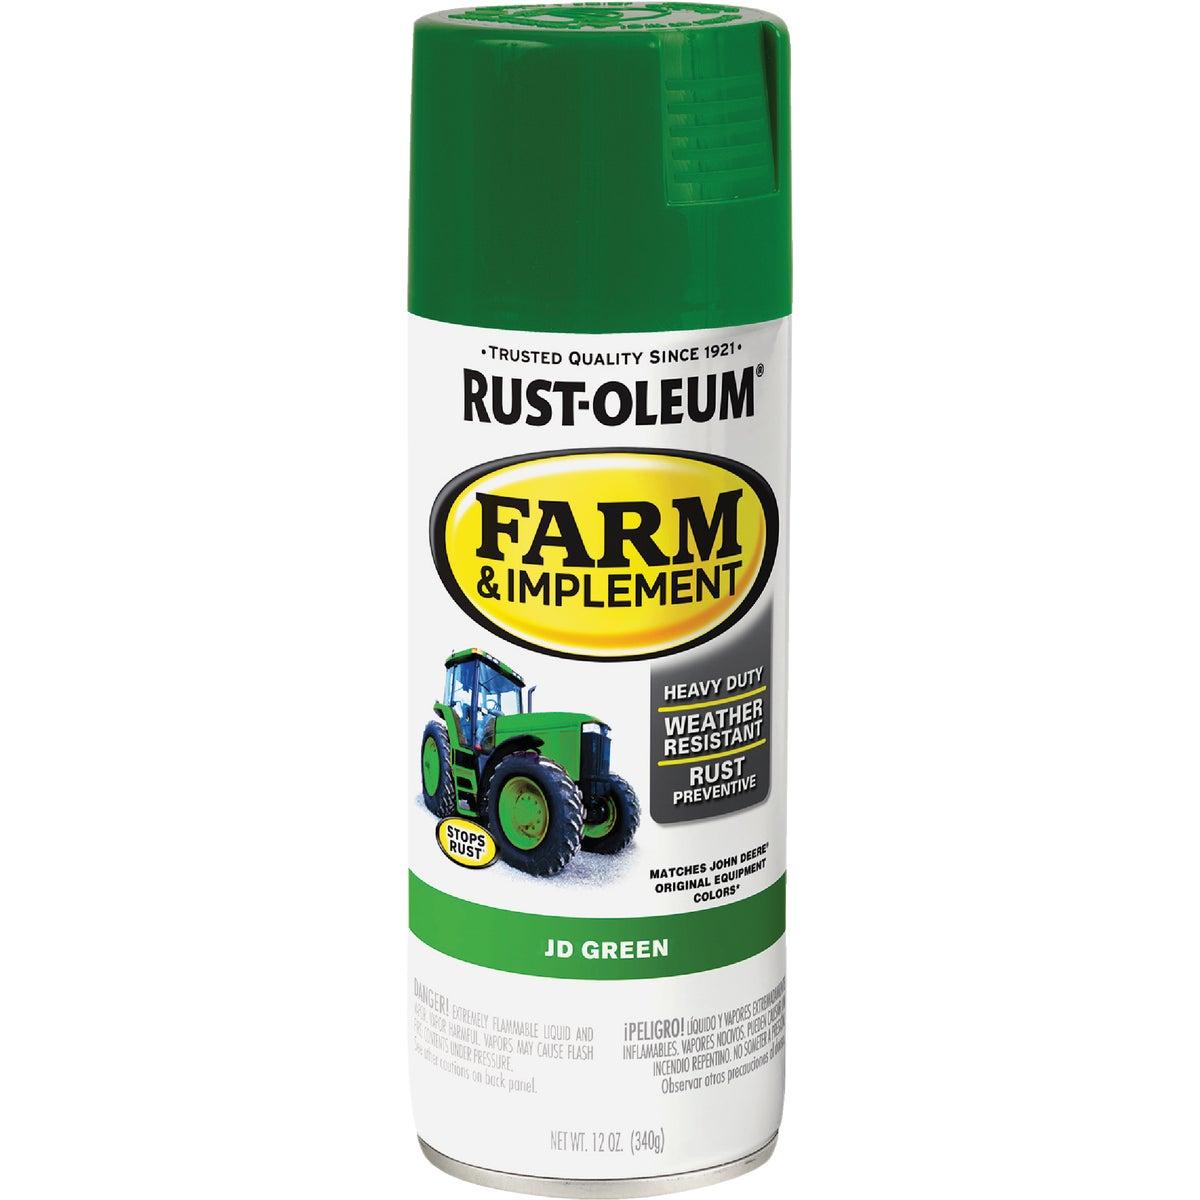 Rust Oleum JD GREEN SPRAY PAINT 7435-830